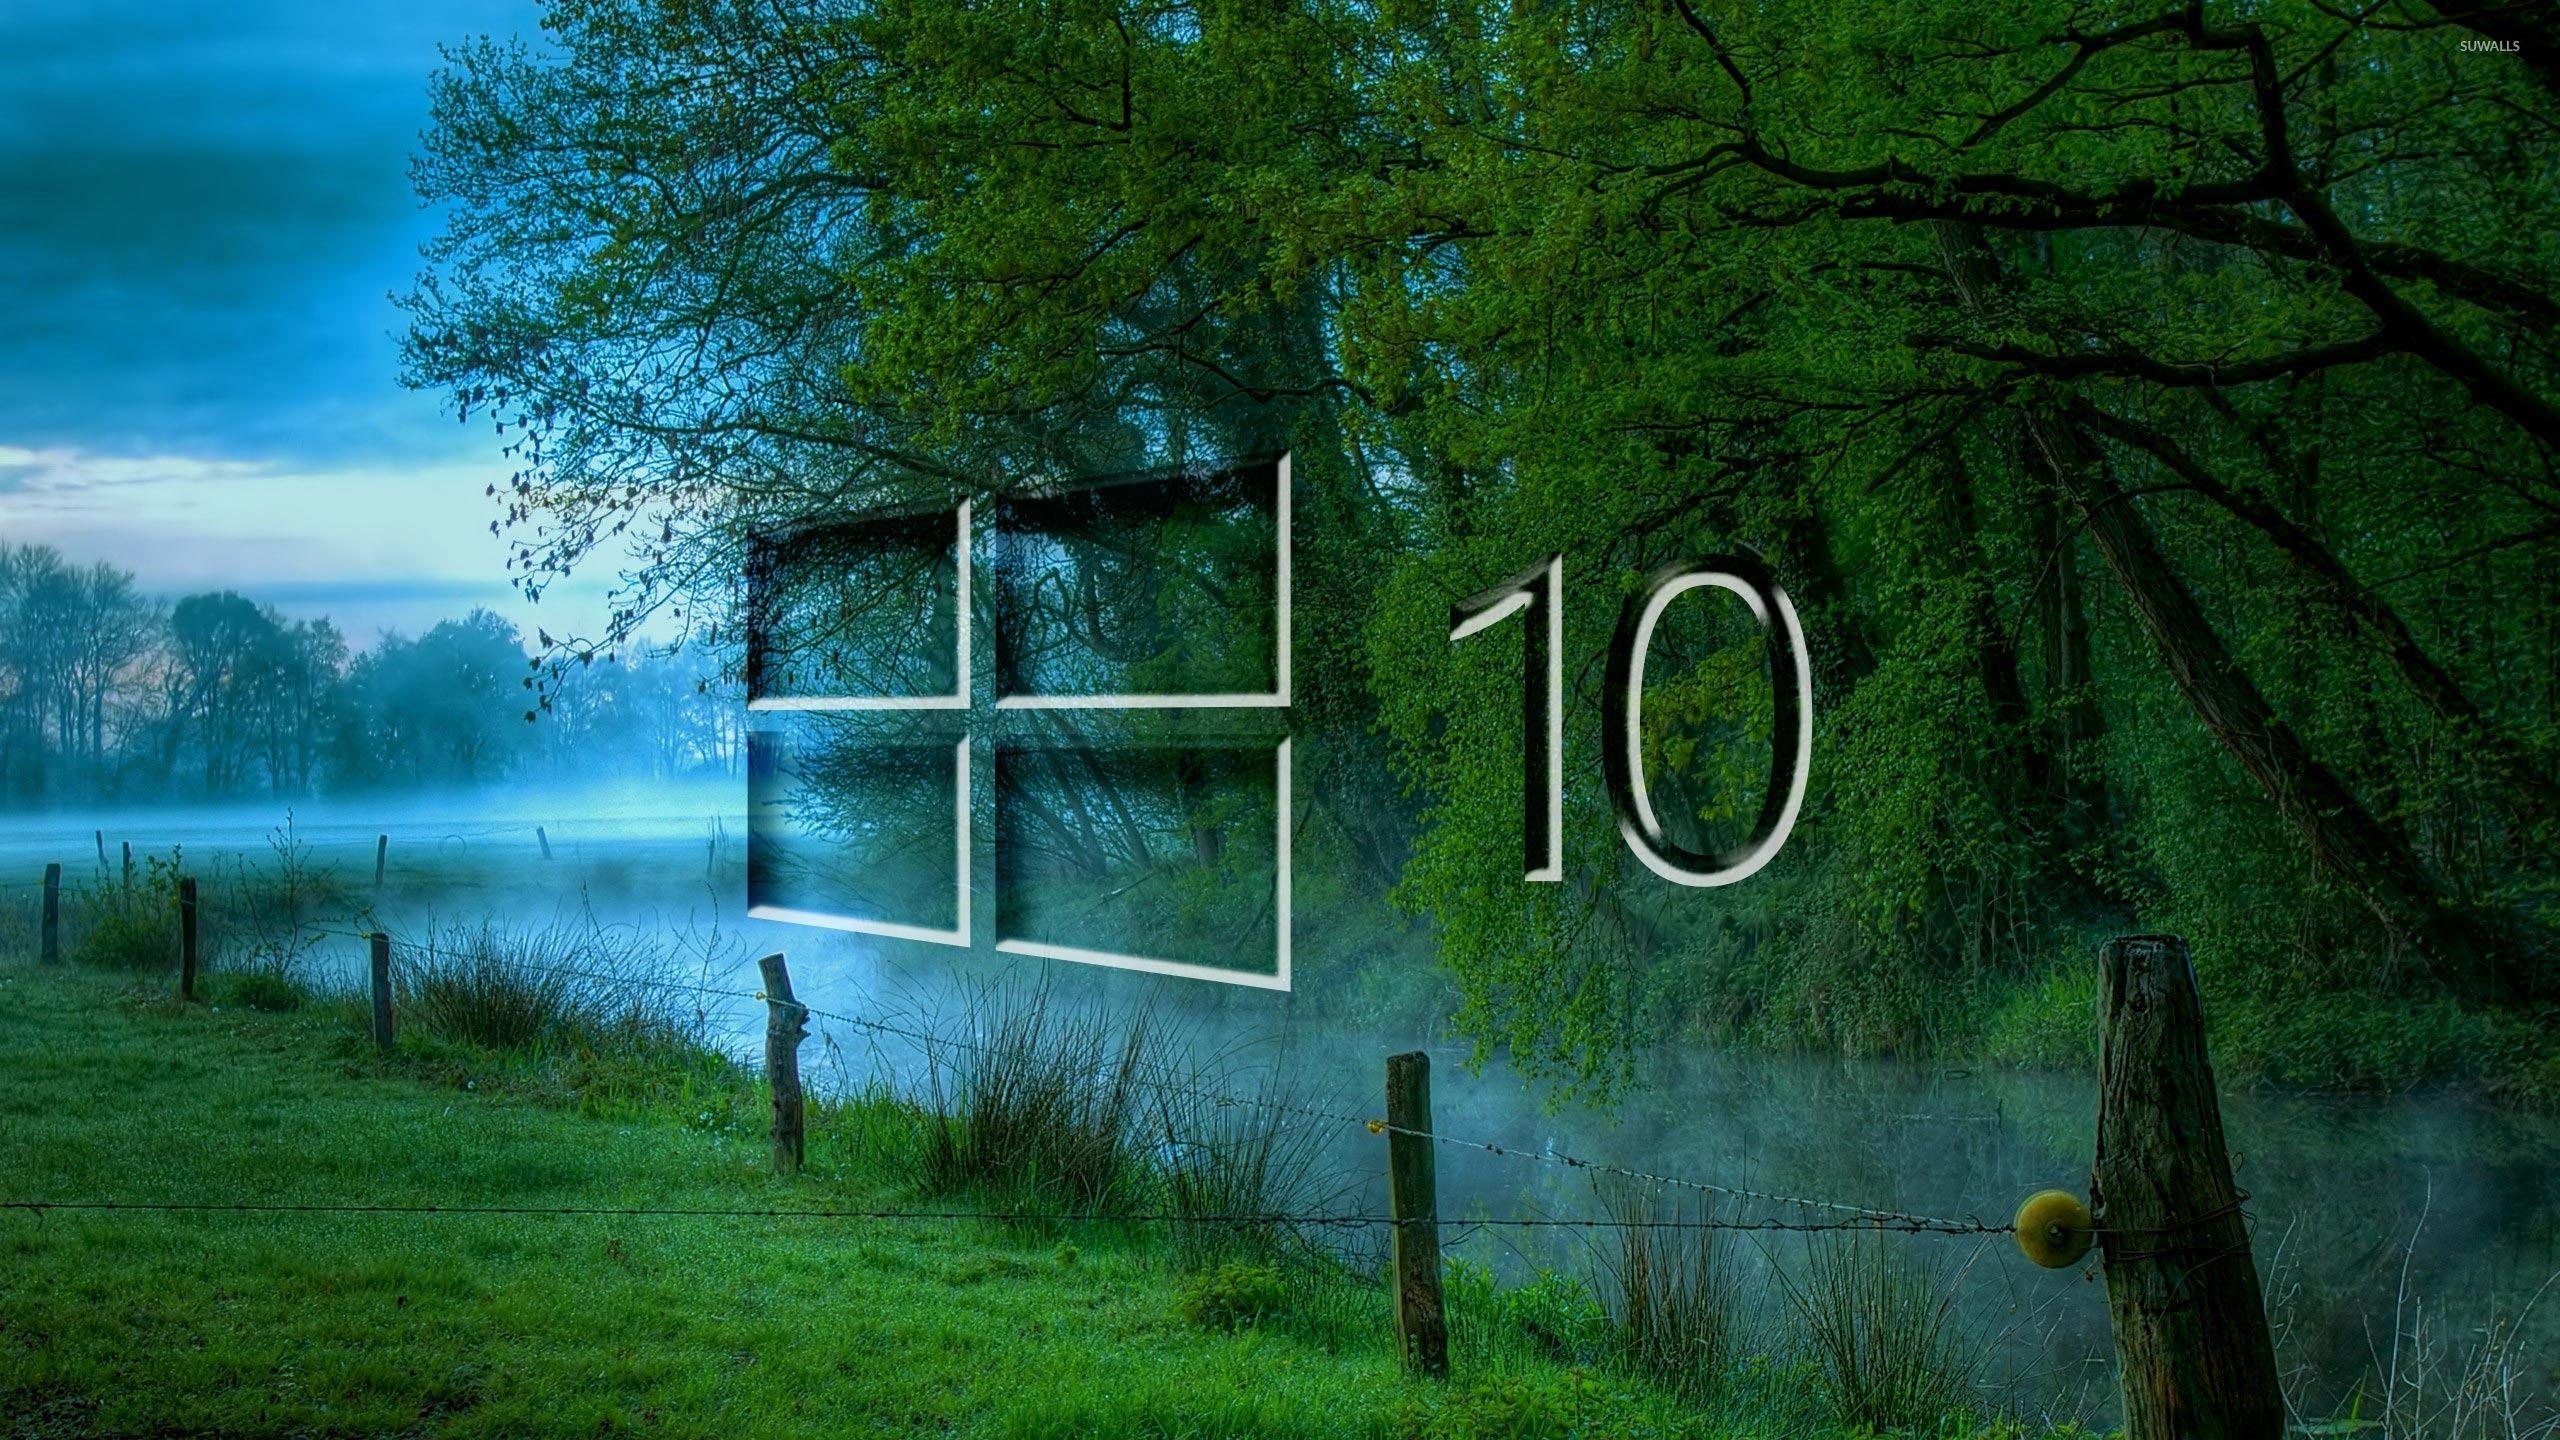 2560x1440 Wallpaper Windows 10 - WallpaperSafari